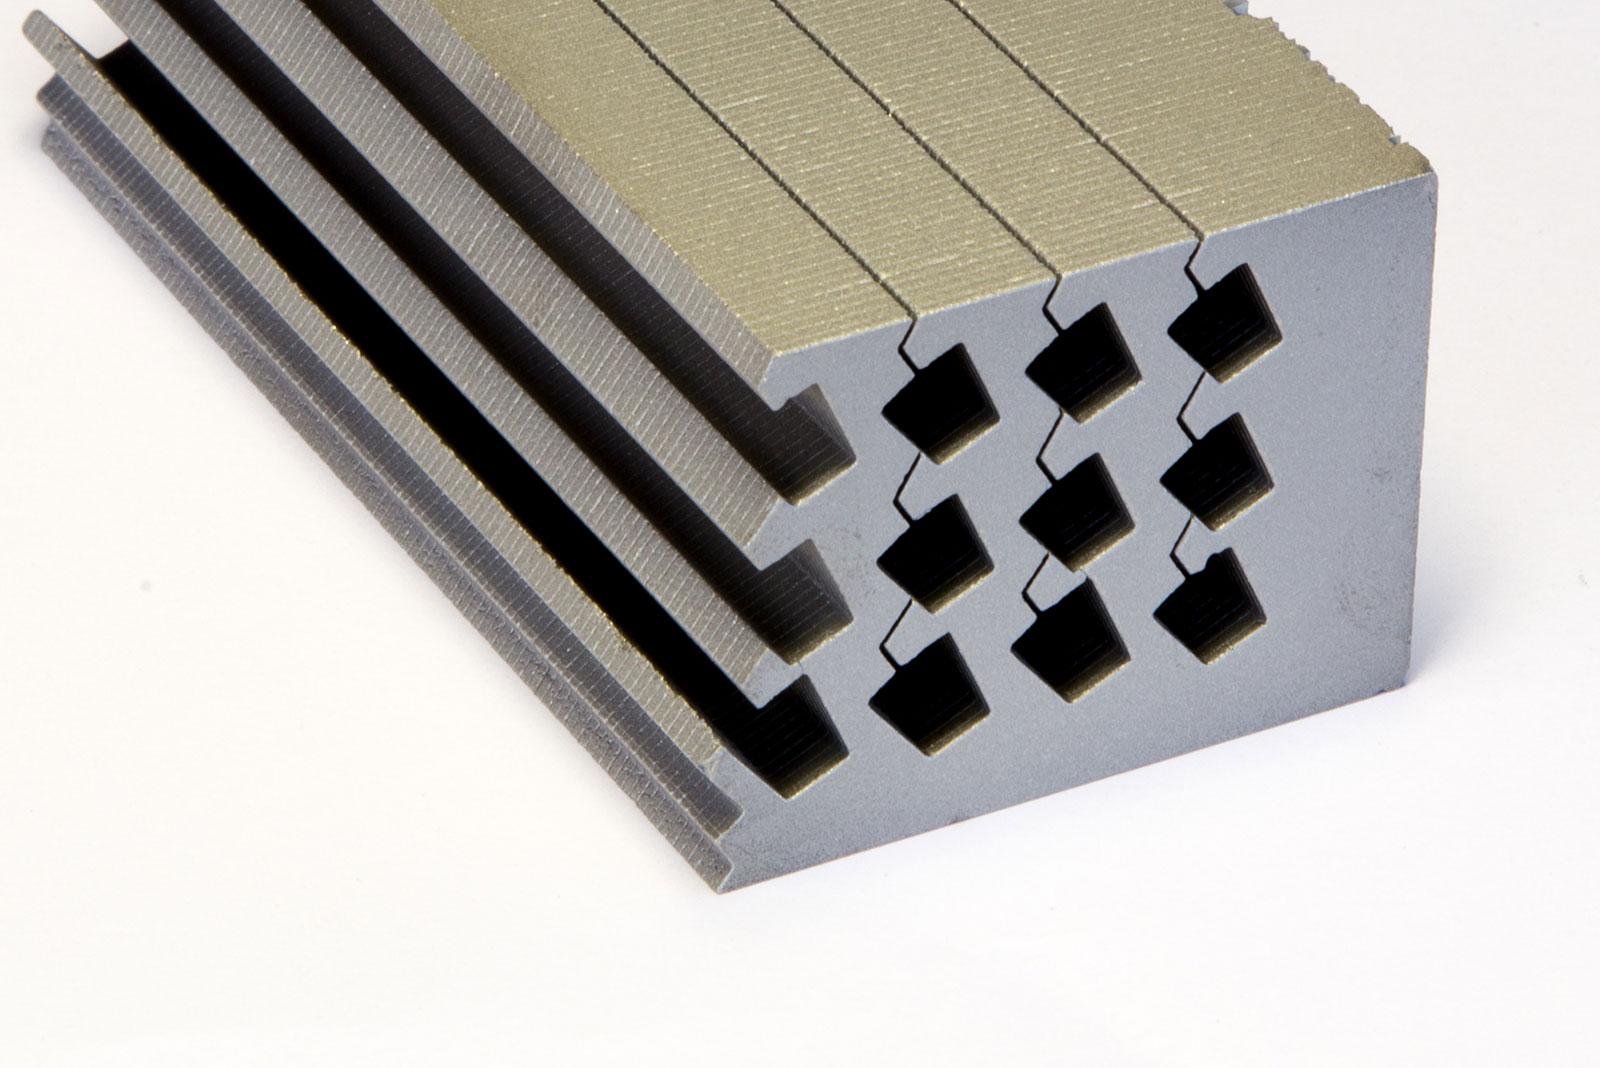 Laminated Magnets